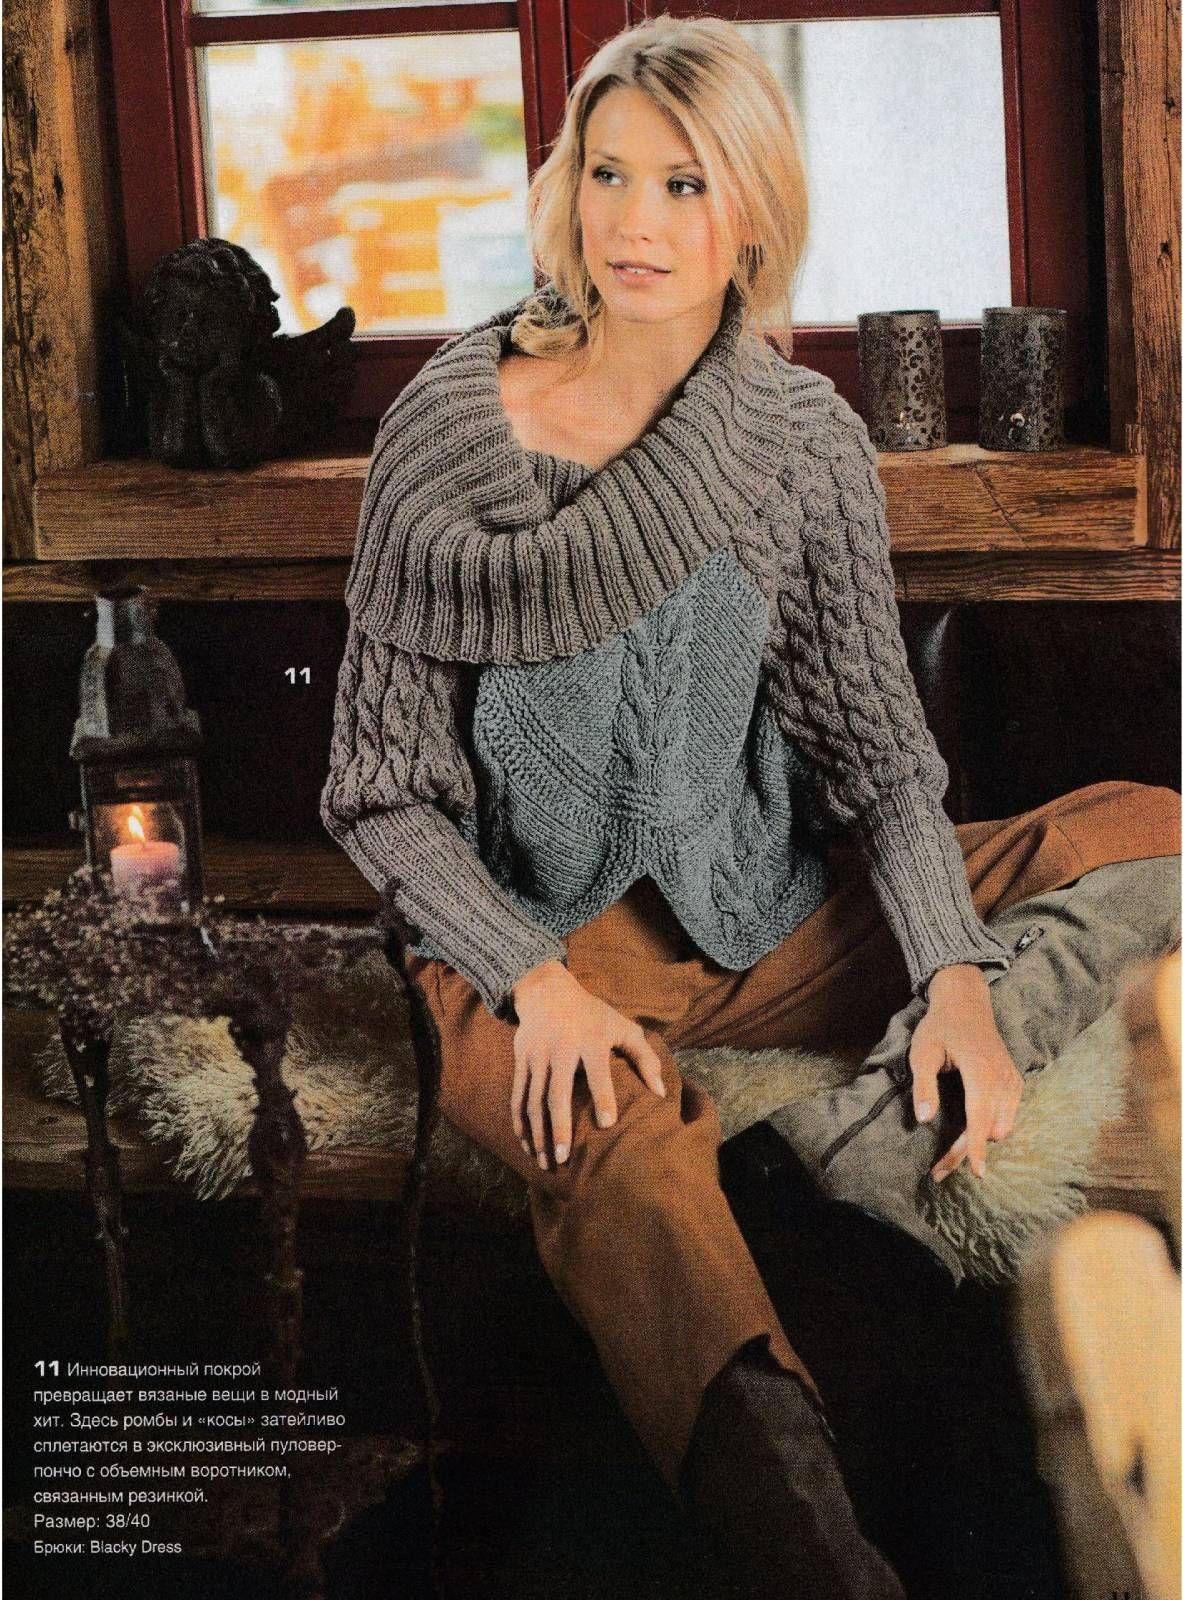 Sweterek - poncho szare i beżowe kolory. Dyskusja na temat ...